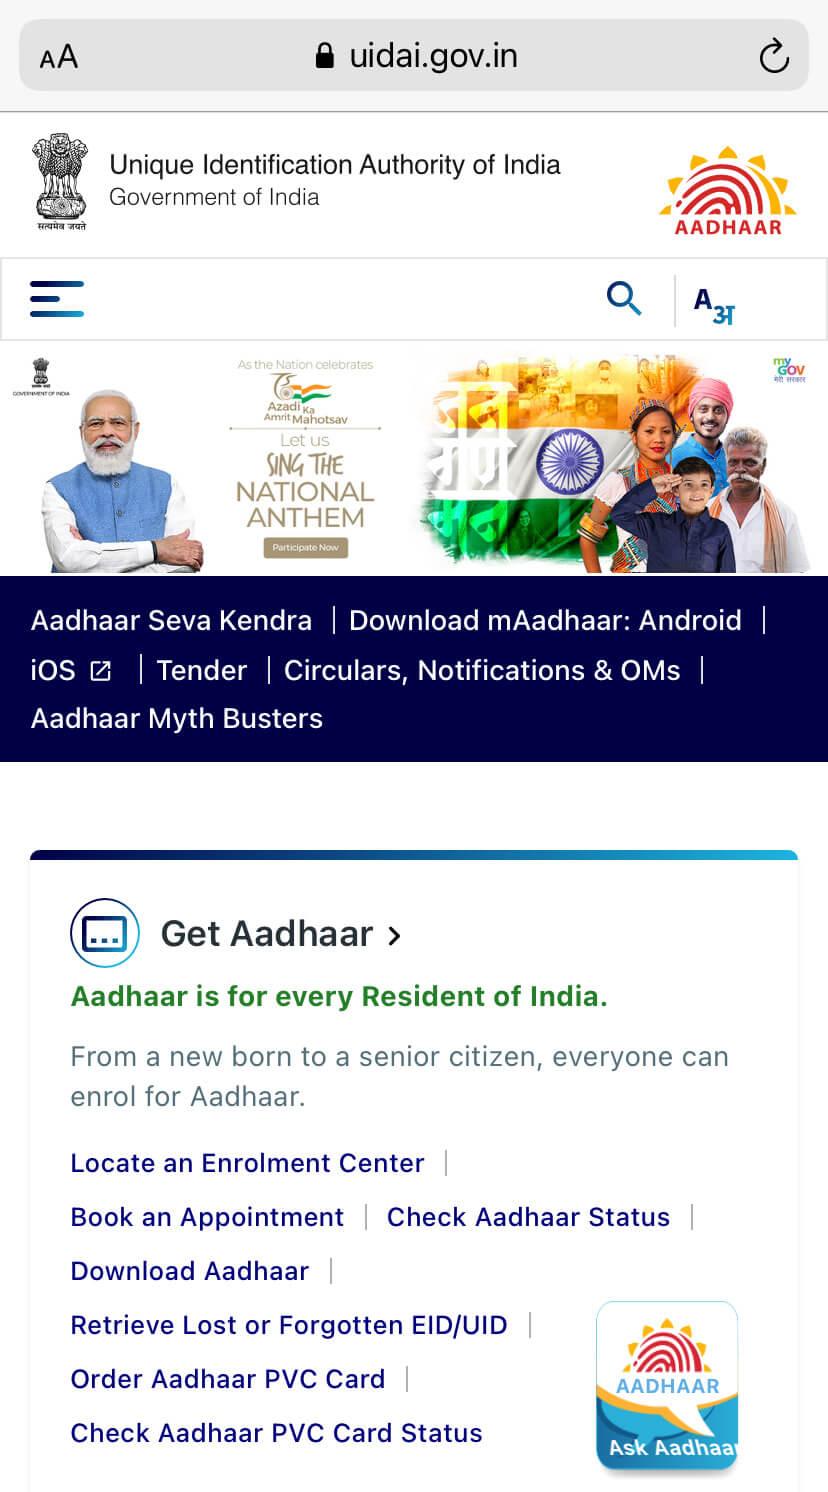 UIDAI website - Download Aadhaar card